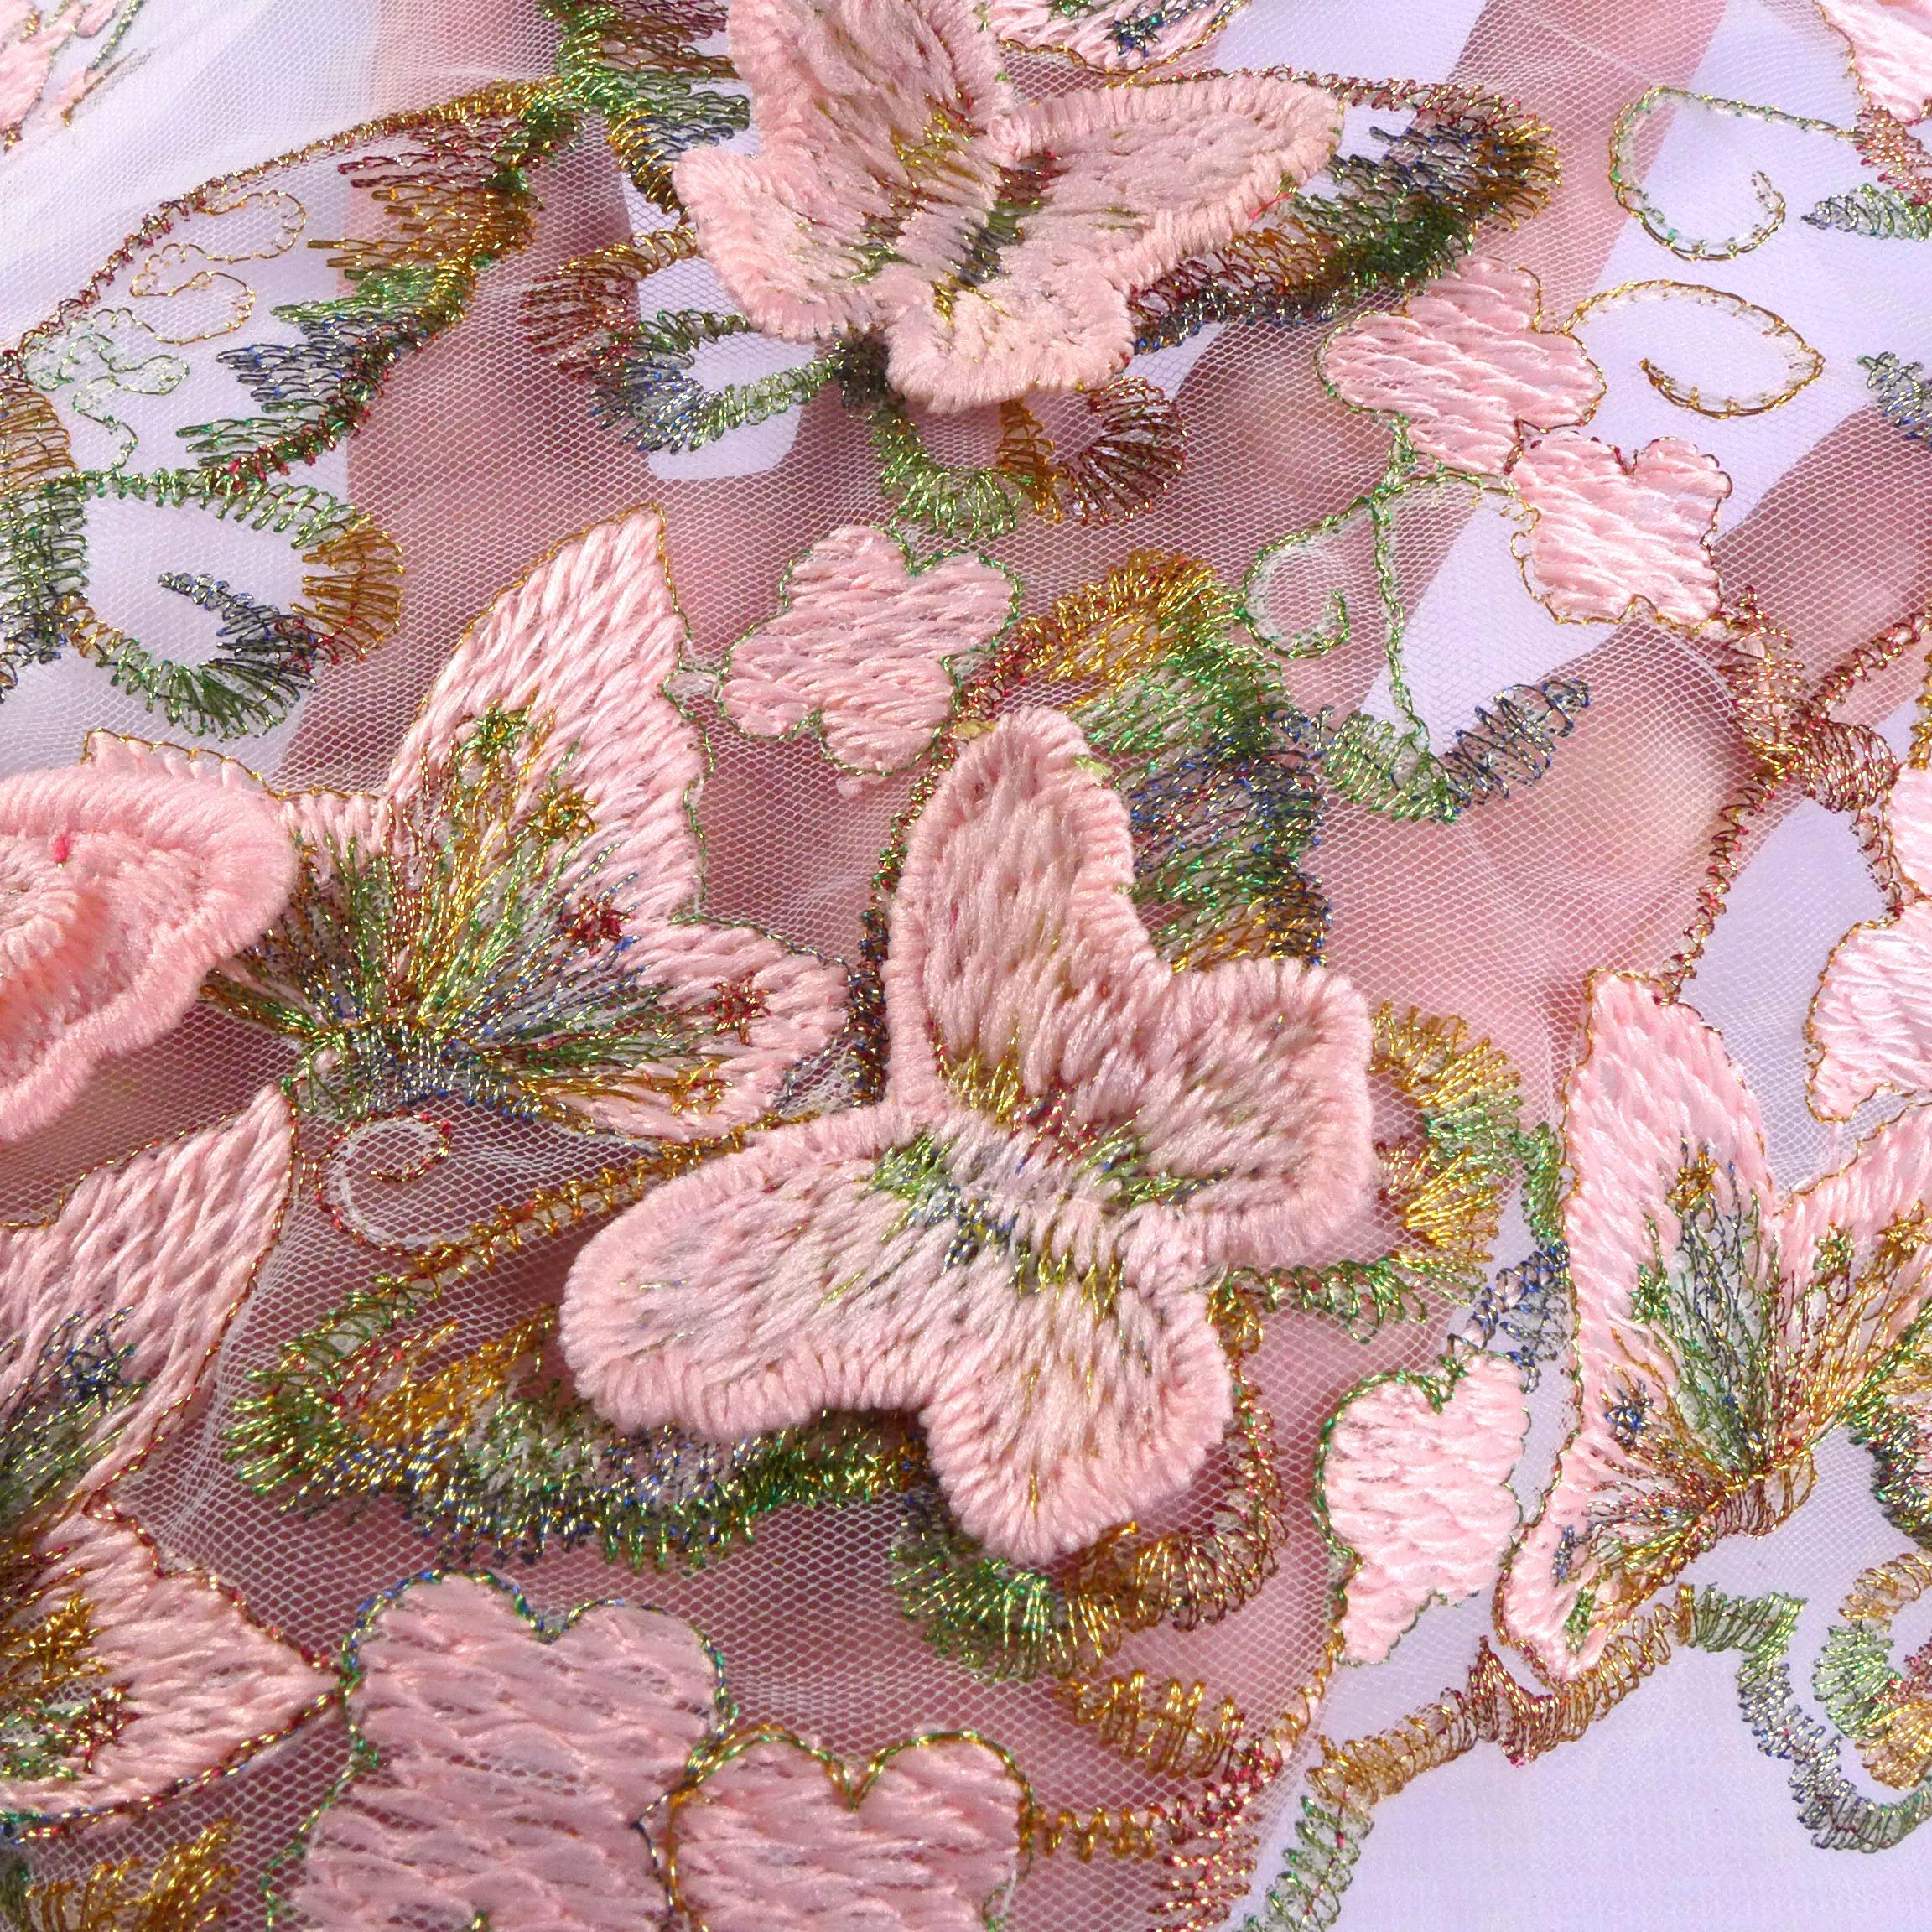 3D Blumen Perlen Strass Spitze Applikation Stoffe Kleid Kostüm Material DIY